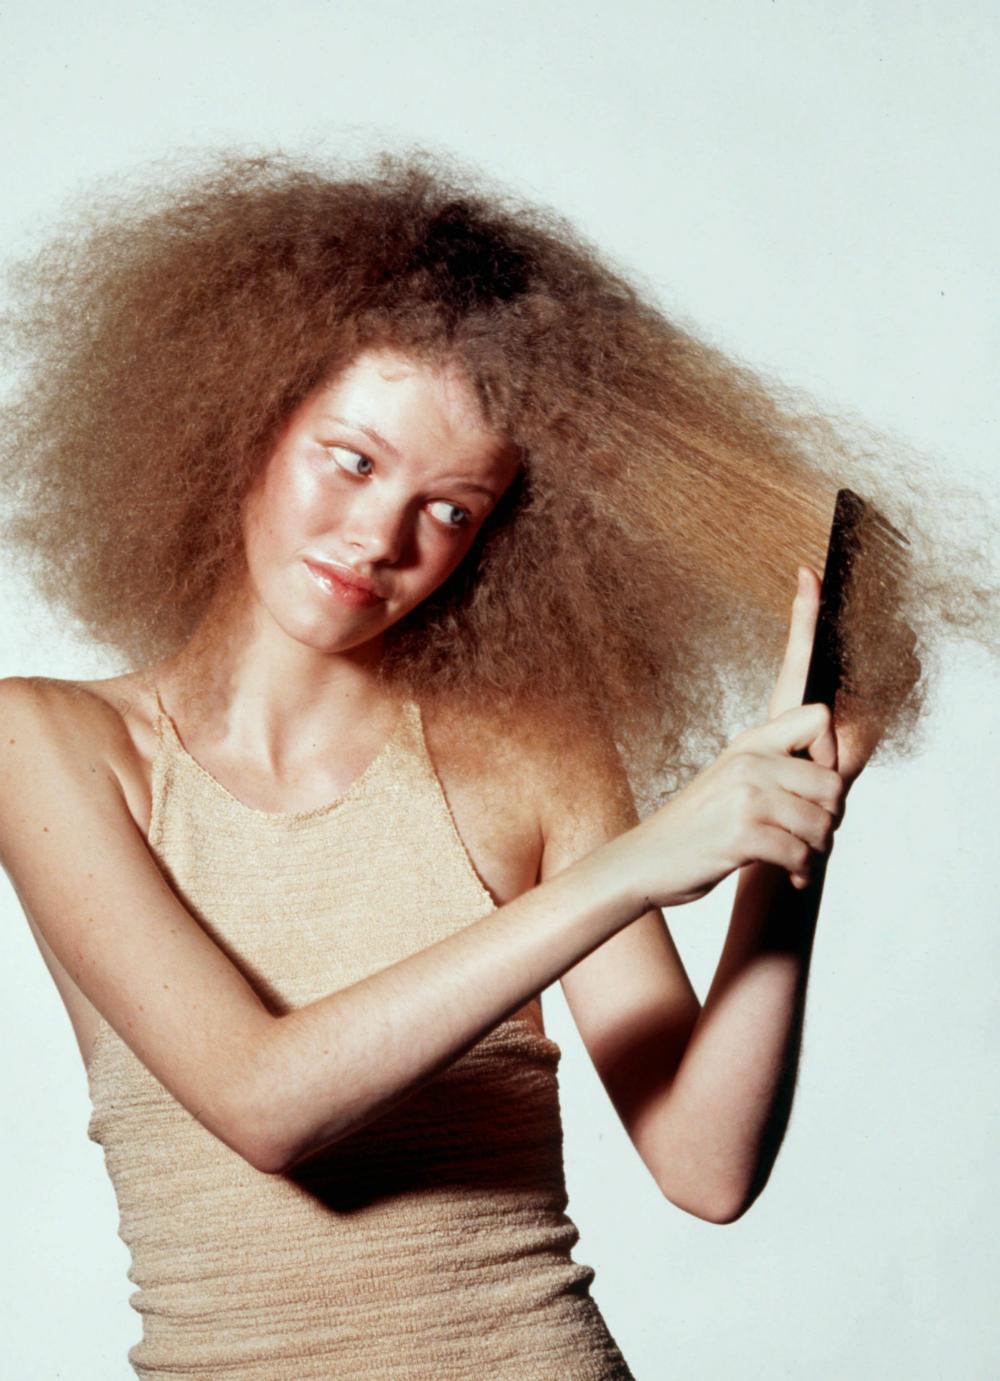 10 consejos sencillos para cuidar tu cabello ondulado dentro de tu rutina